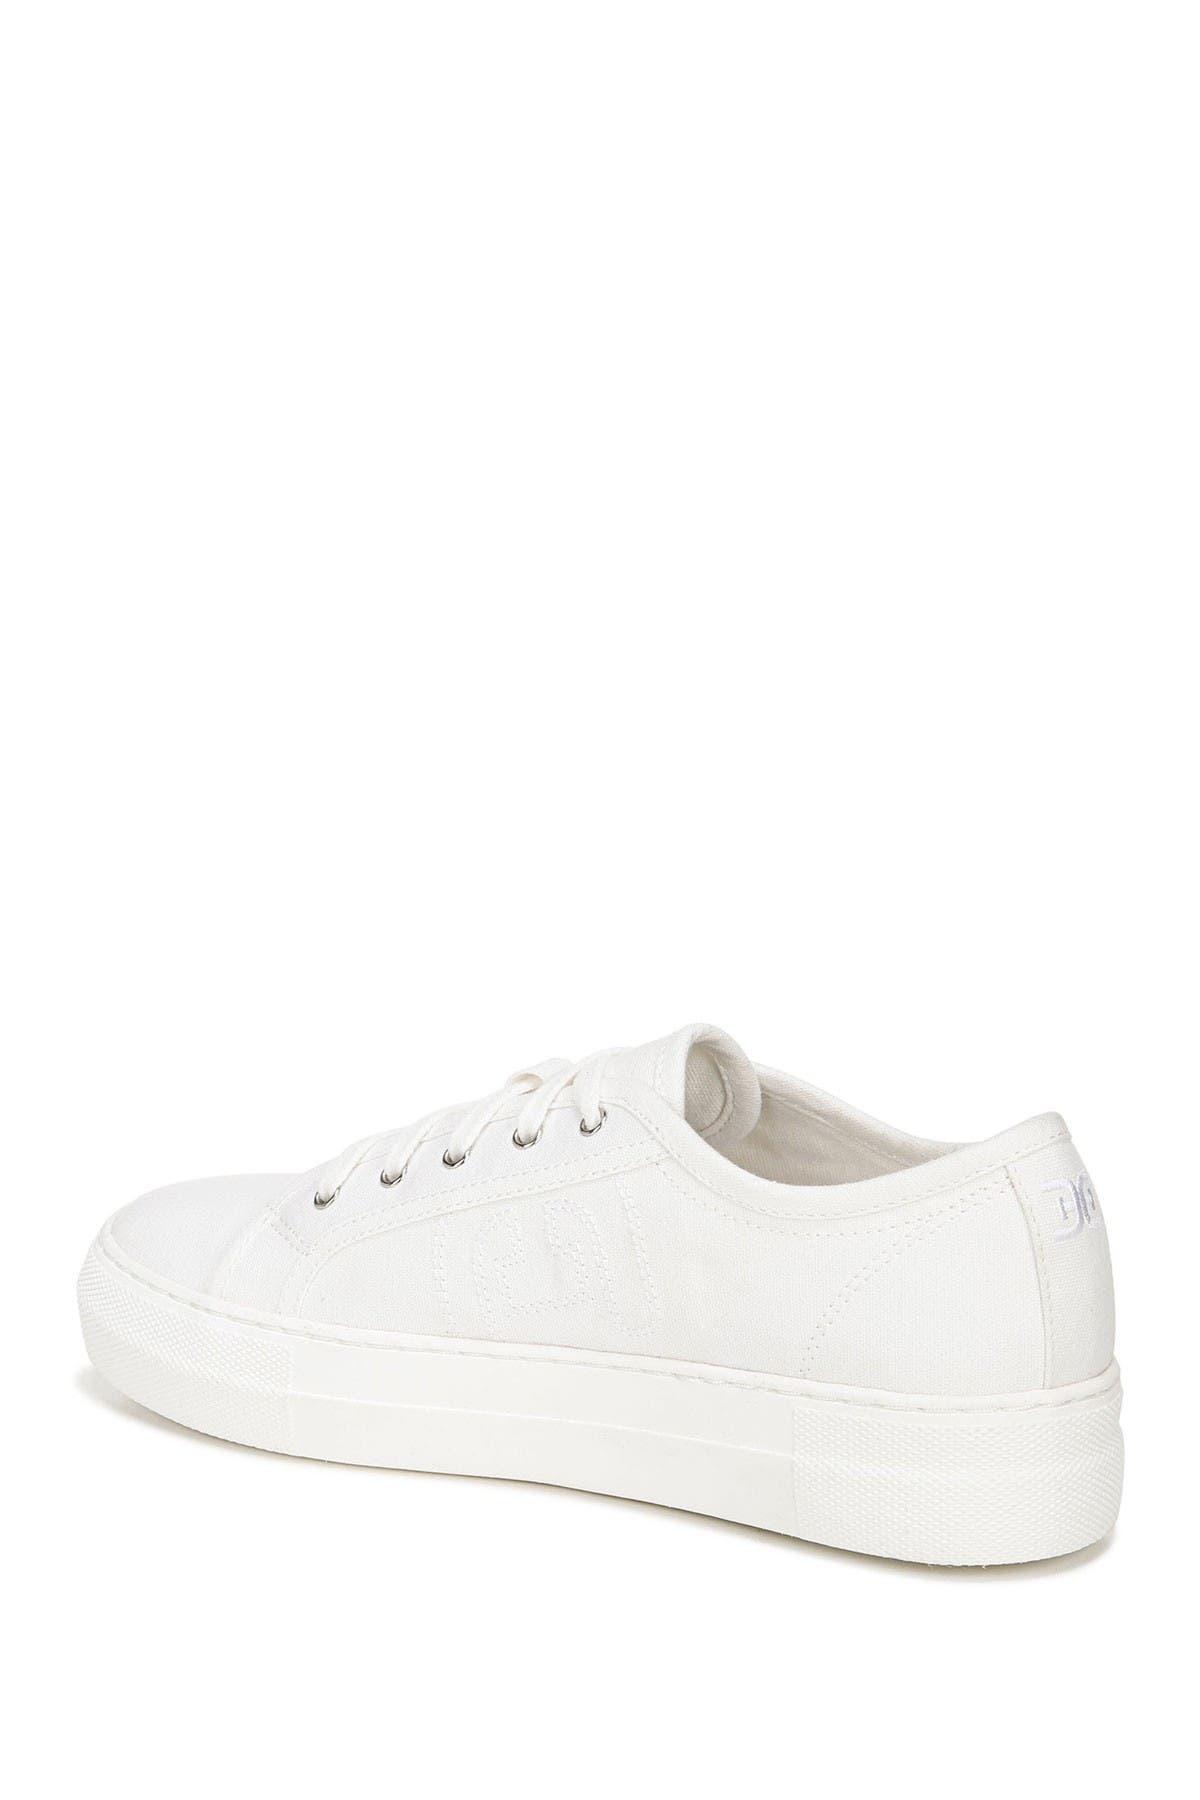 Sam Edelman | Genara Low Top Sneaker